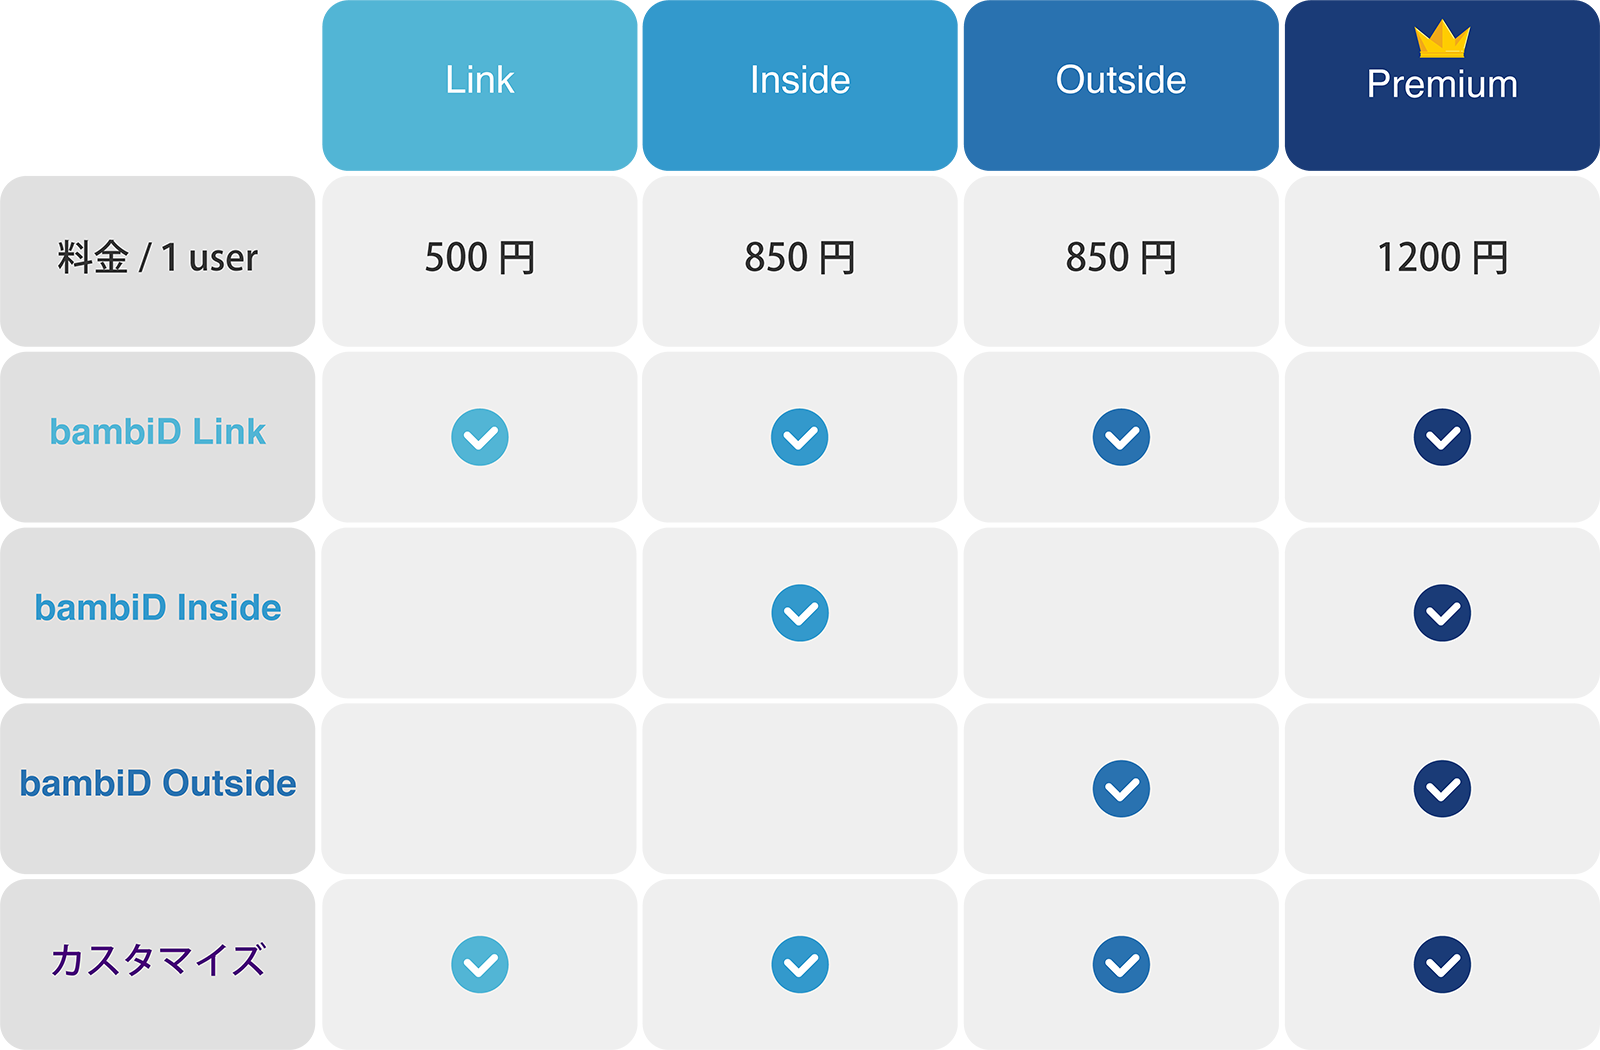 IoT 位置情報管理アプリケーション bambiD 料金表